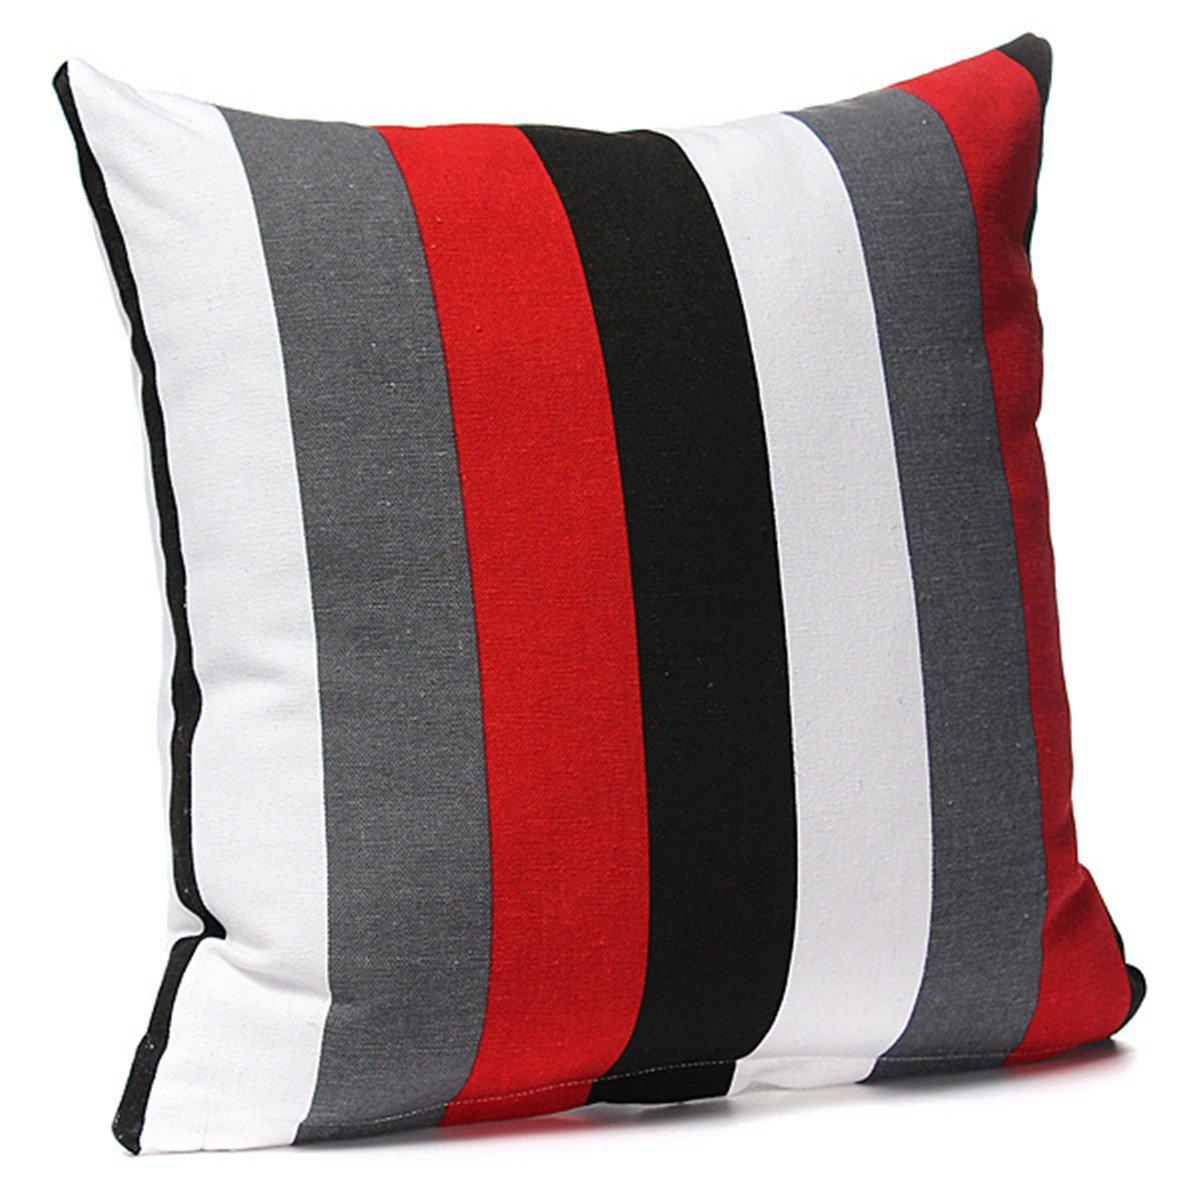 2x kissenh lle 40x40 dekokissen baumwolle kissenbezug rot. Black Bedroom Furniture Sets. Home Design Ideas